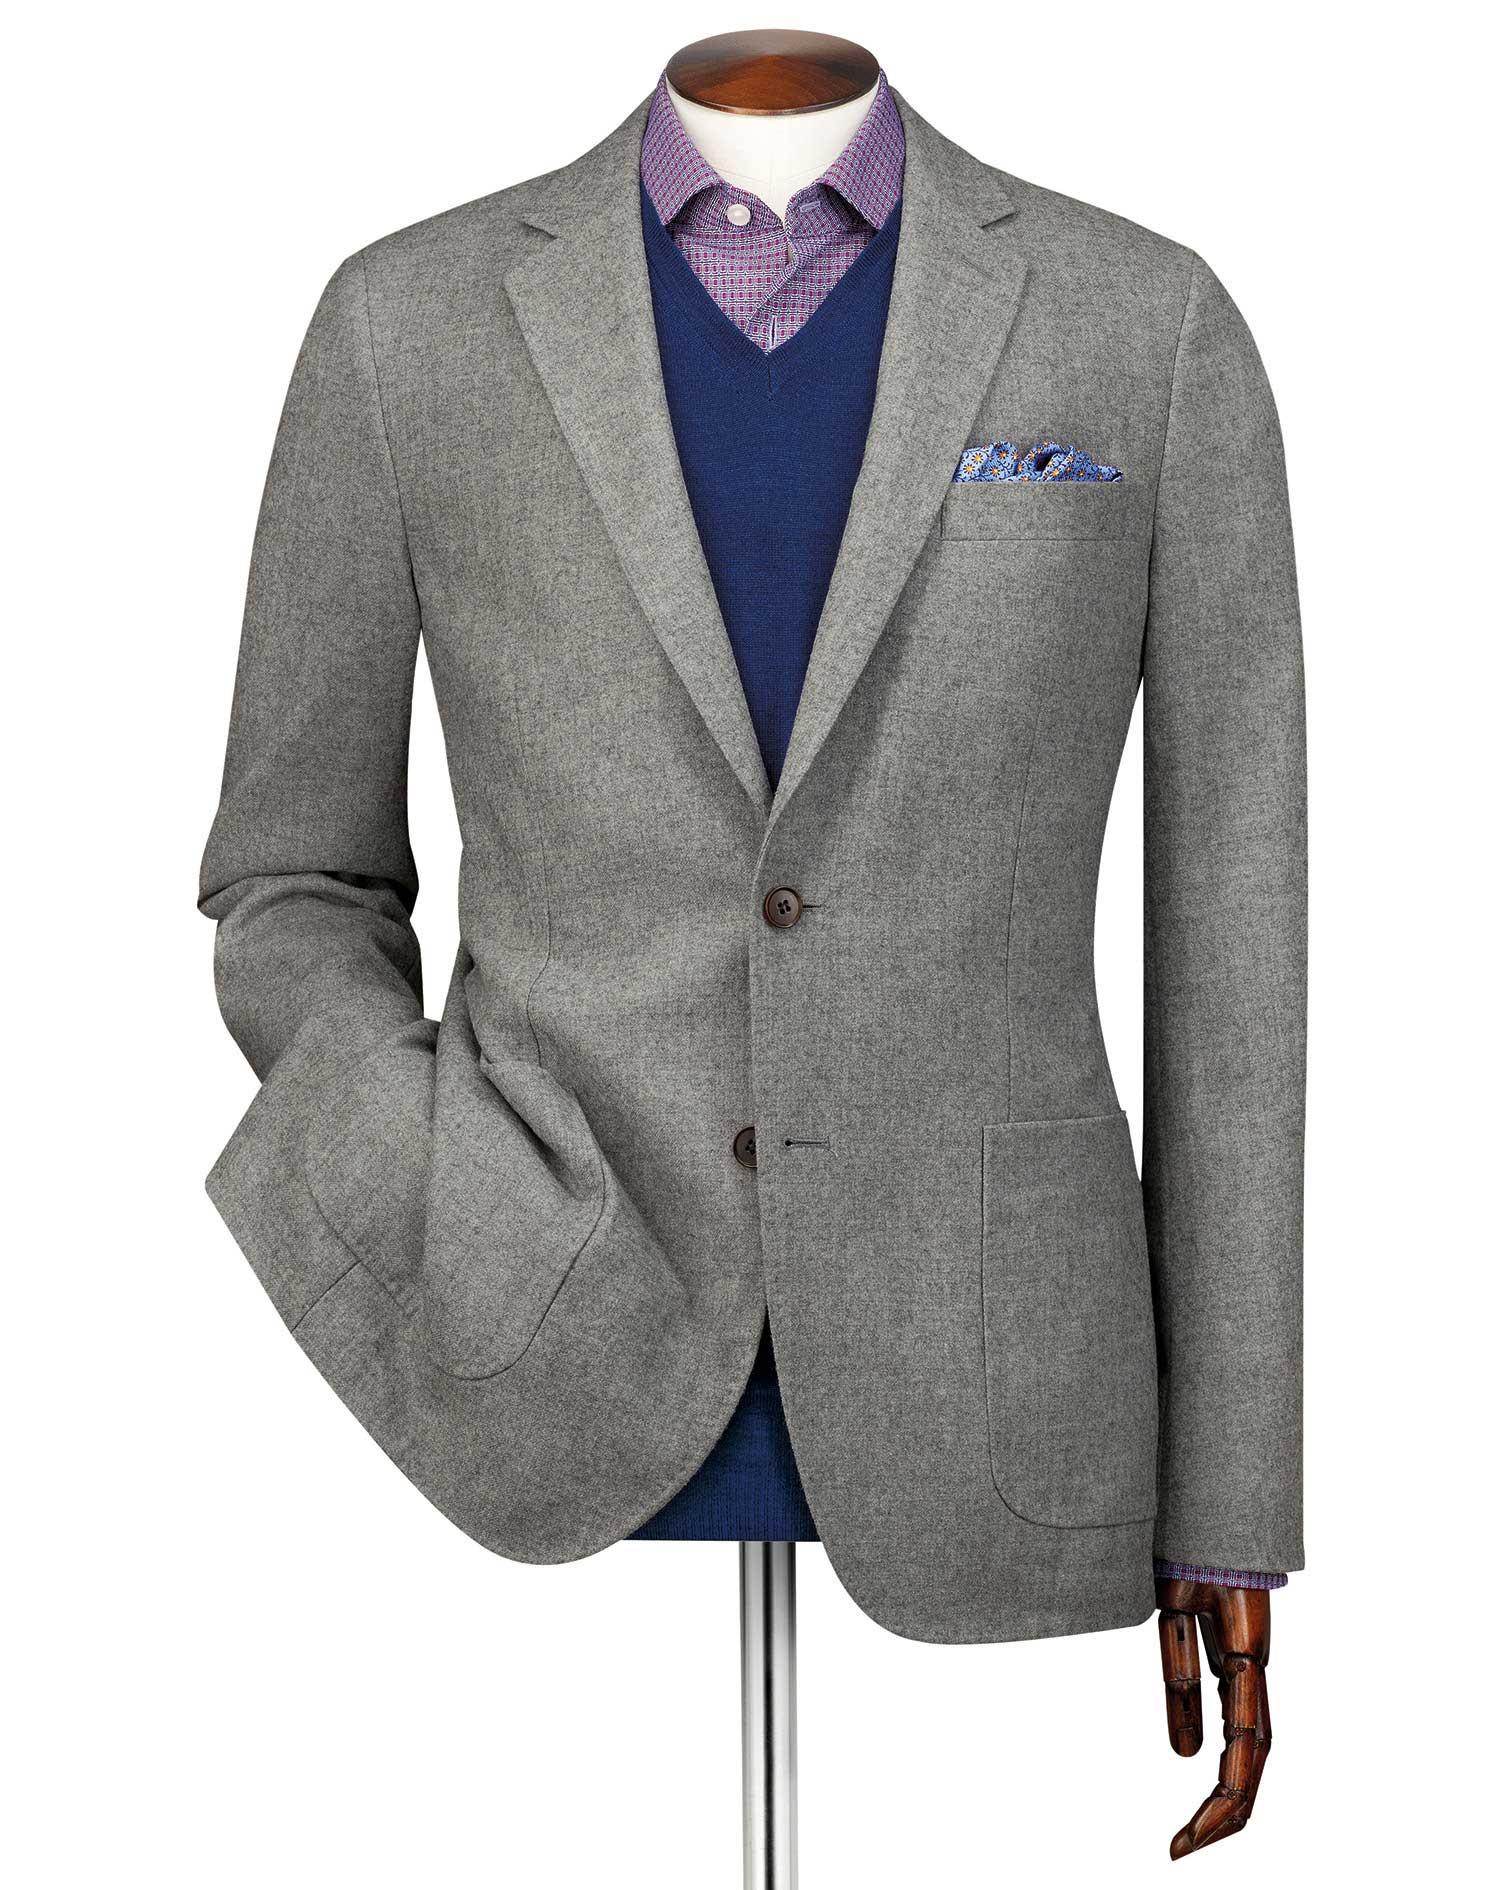 Slim Fit Light Grey Modern Wool Blazer Size 44 Long by Charles Tyrwhitt